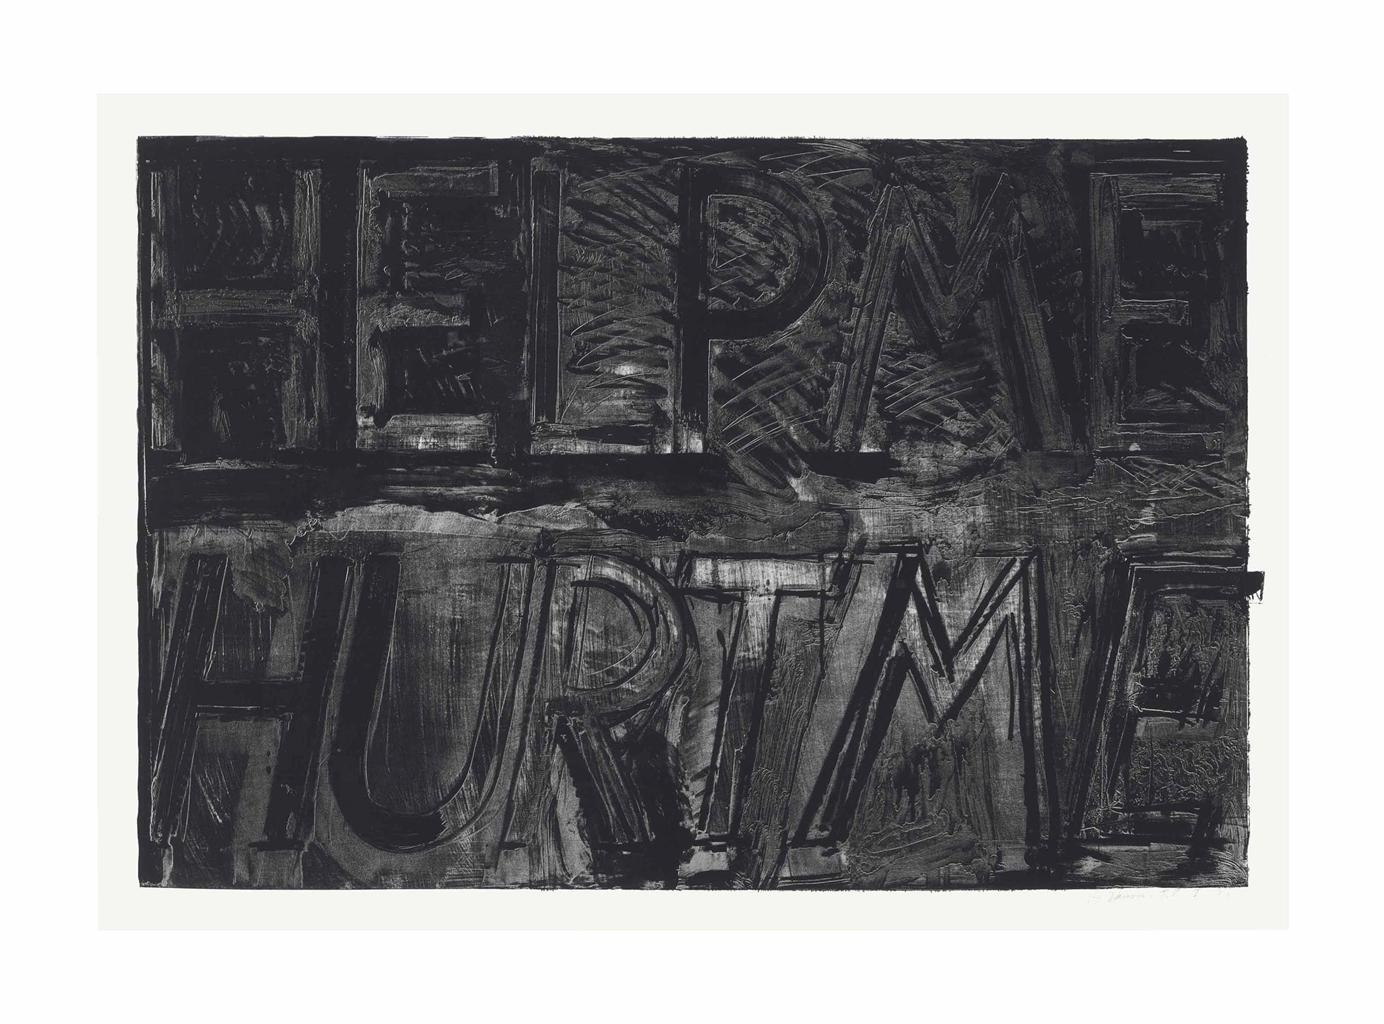 Bruce Nauman-Help Me Hurt Me from Sundry Obras Nuevas-1975